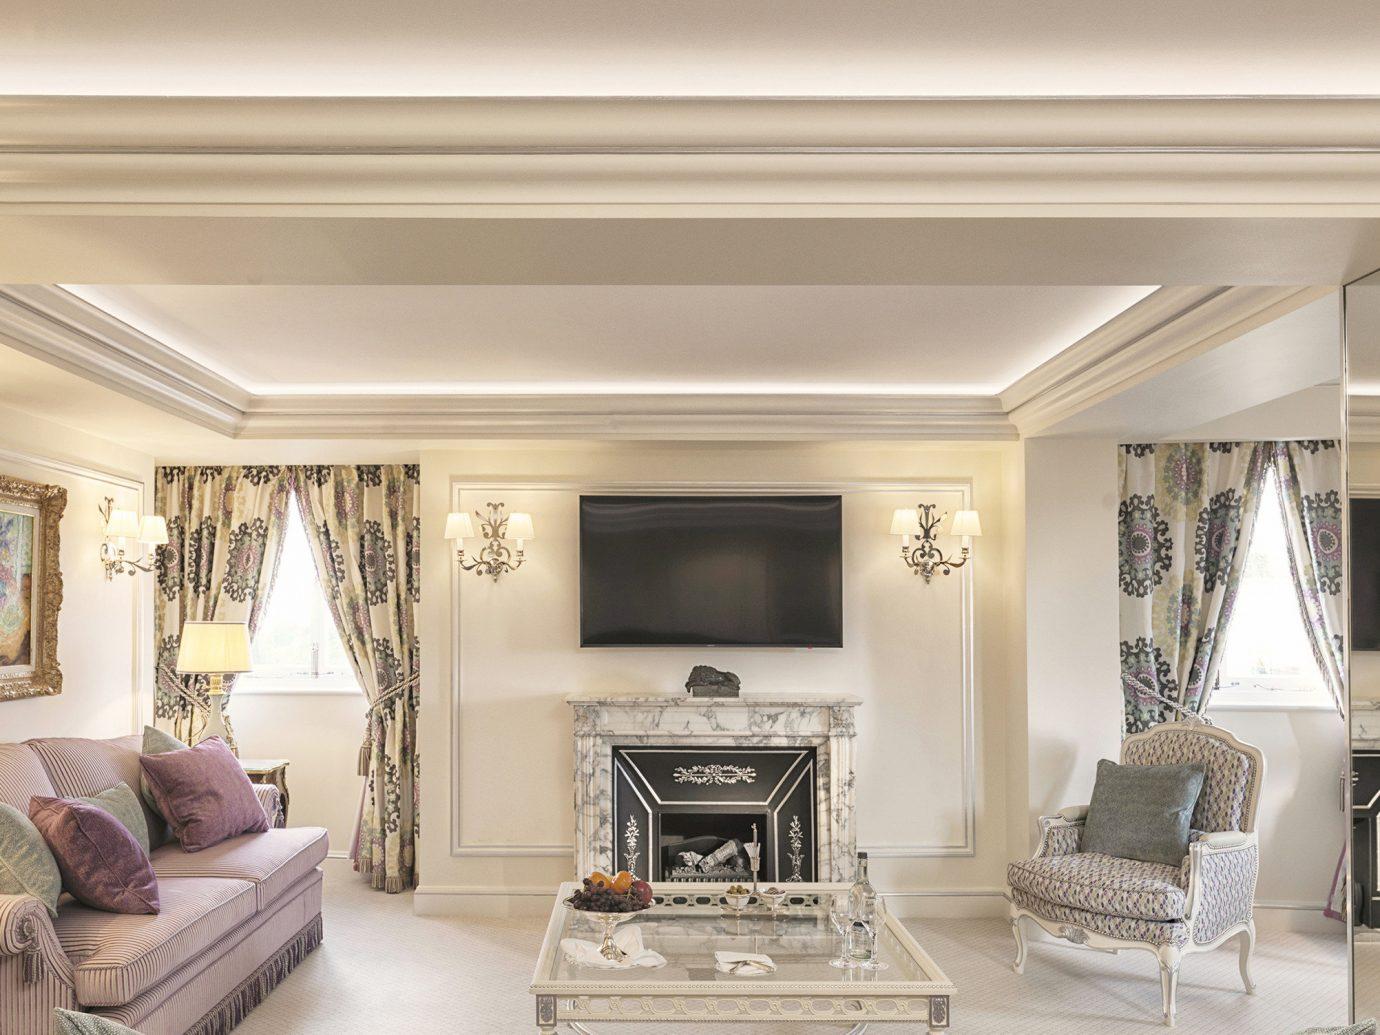 Hotels London Luxury Travel indoor sofa room wall Living ceiling living room bed interior design furniture home floor molding interior designer flooring window estate decorated Bedroom area